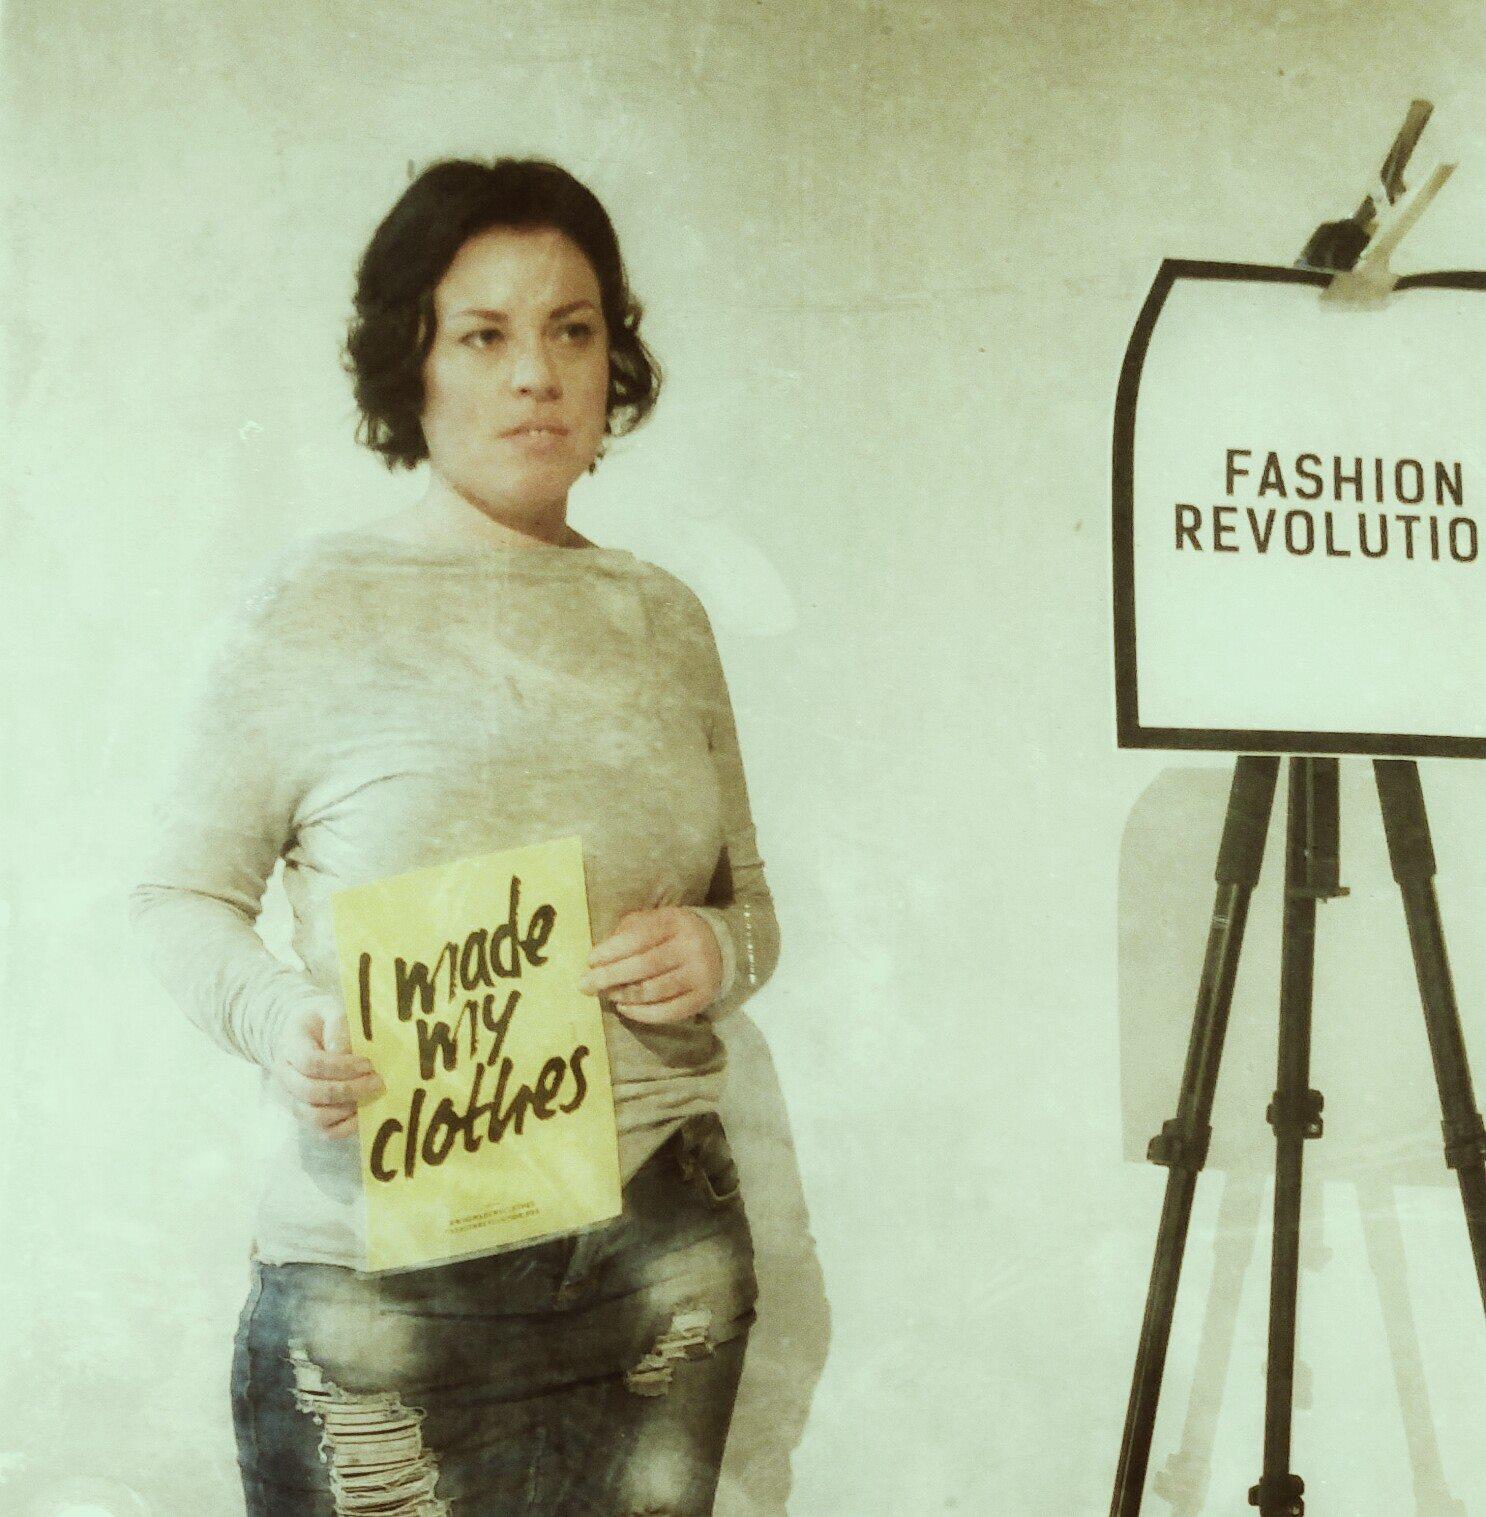 FashionRevolution2016 16.jpg